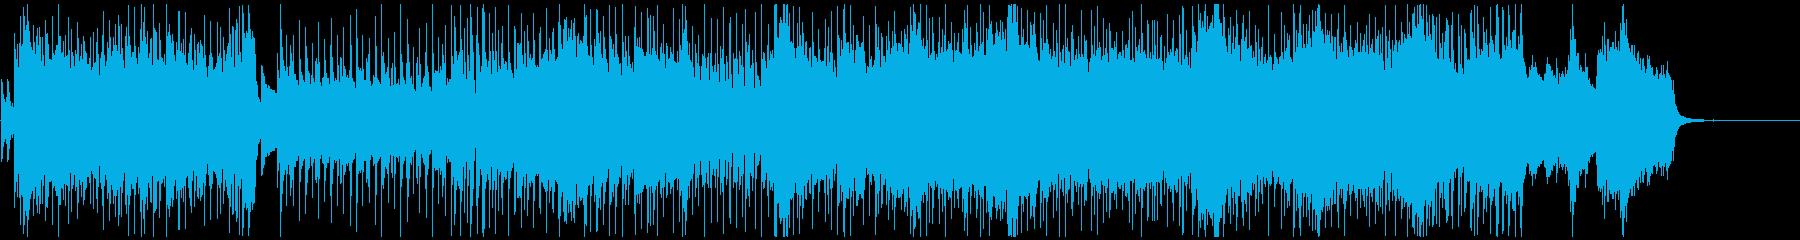 Star IVの再生済みの波形